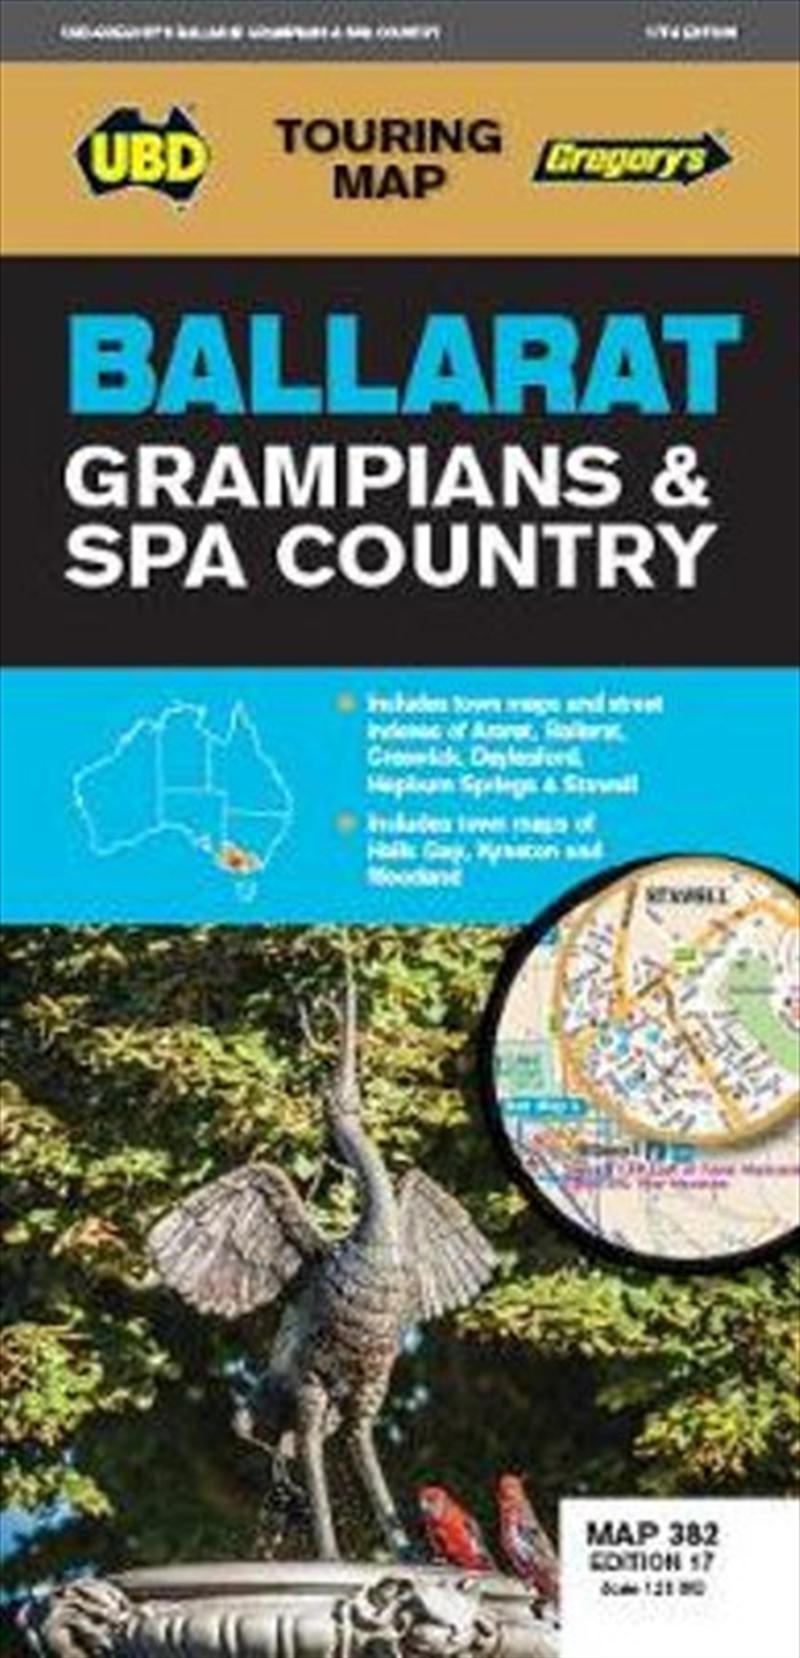 Ballarat Grampians & Spa Country Map 382 17th ed Touring Map | Sheet Map